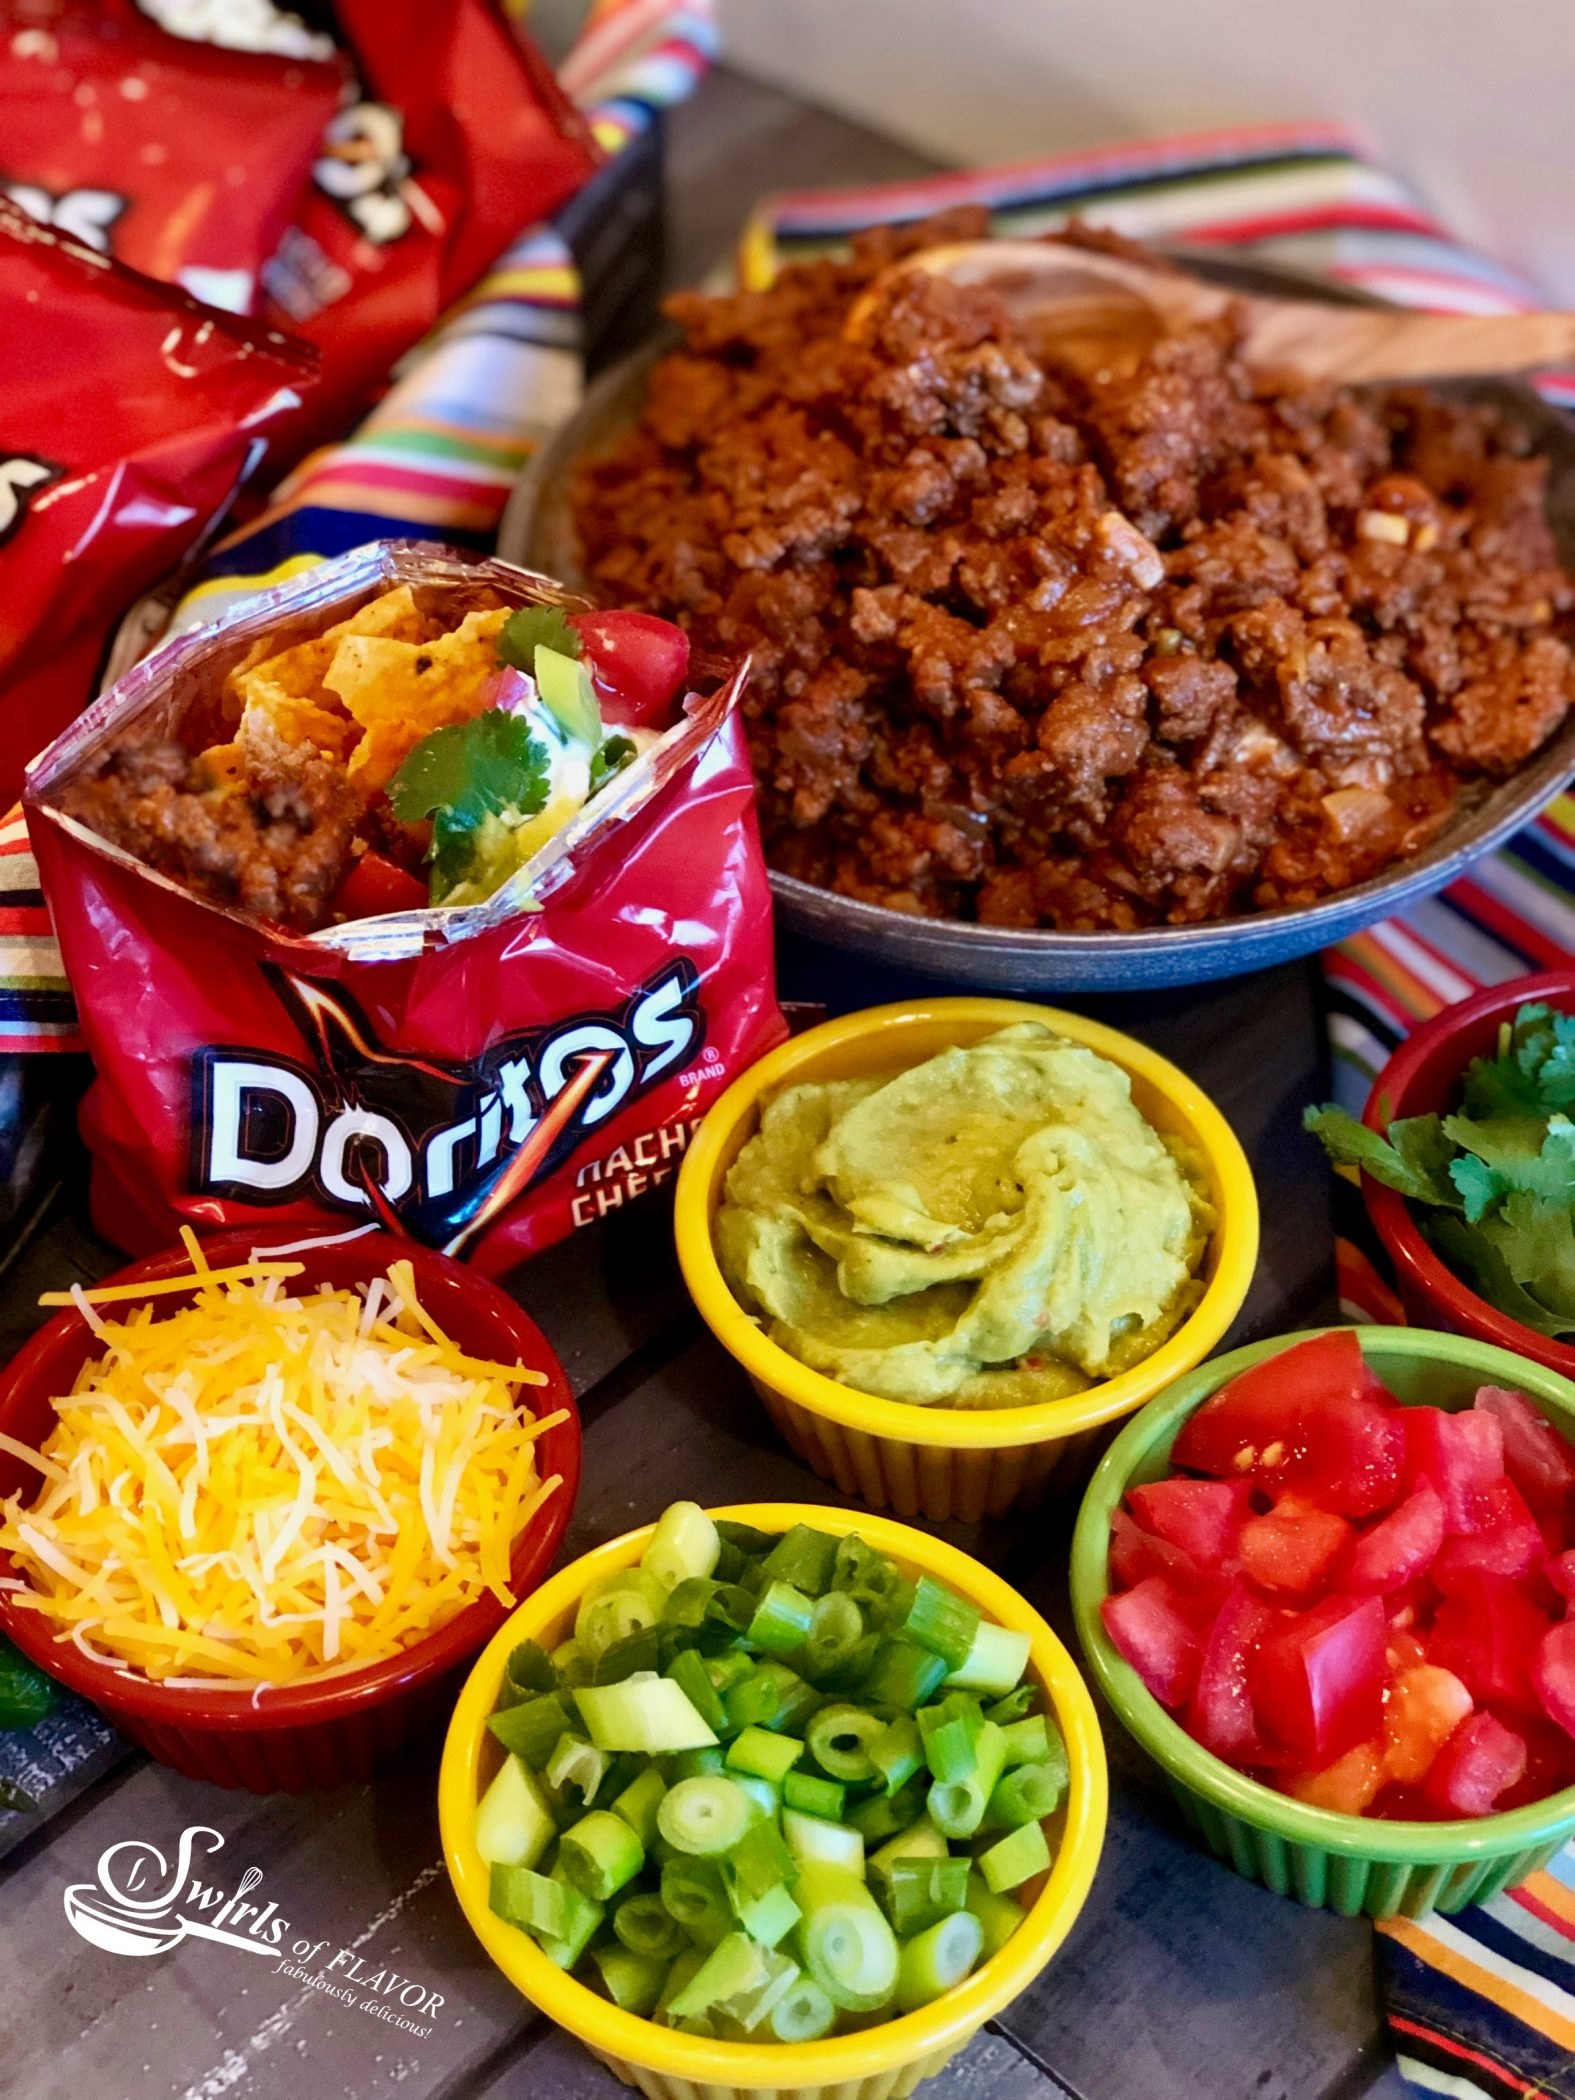 Walking Taco Bar ingredients in bowls with Doritos bag